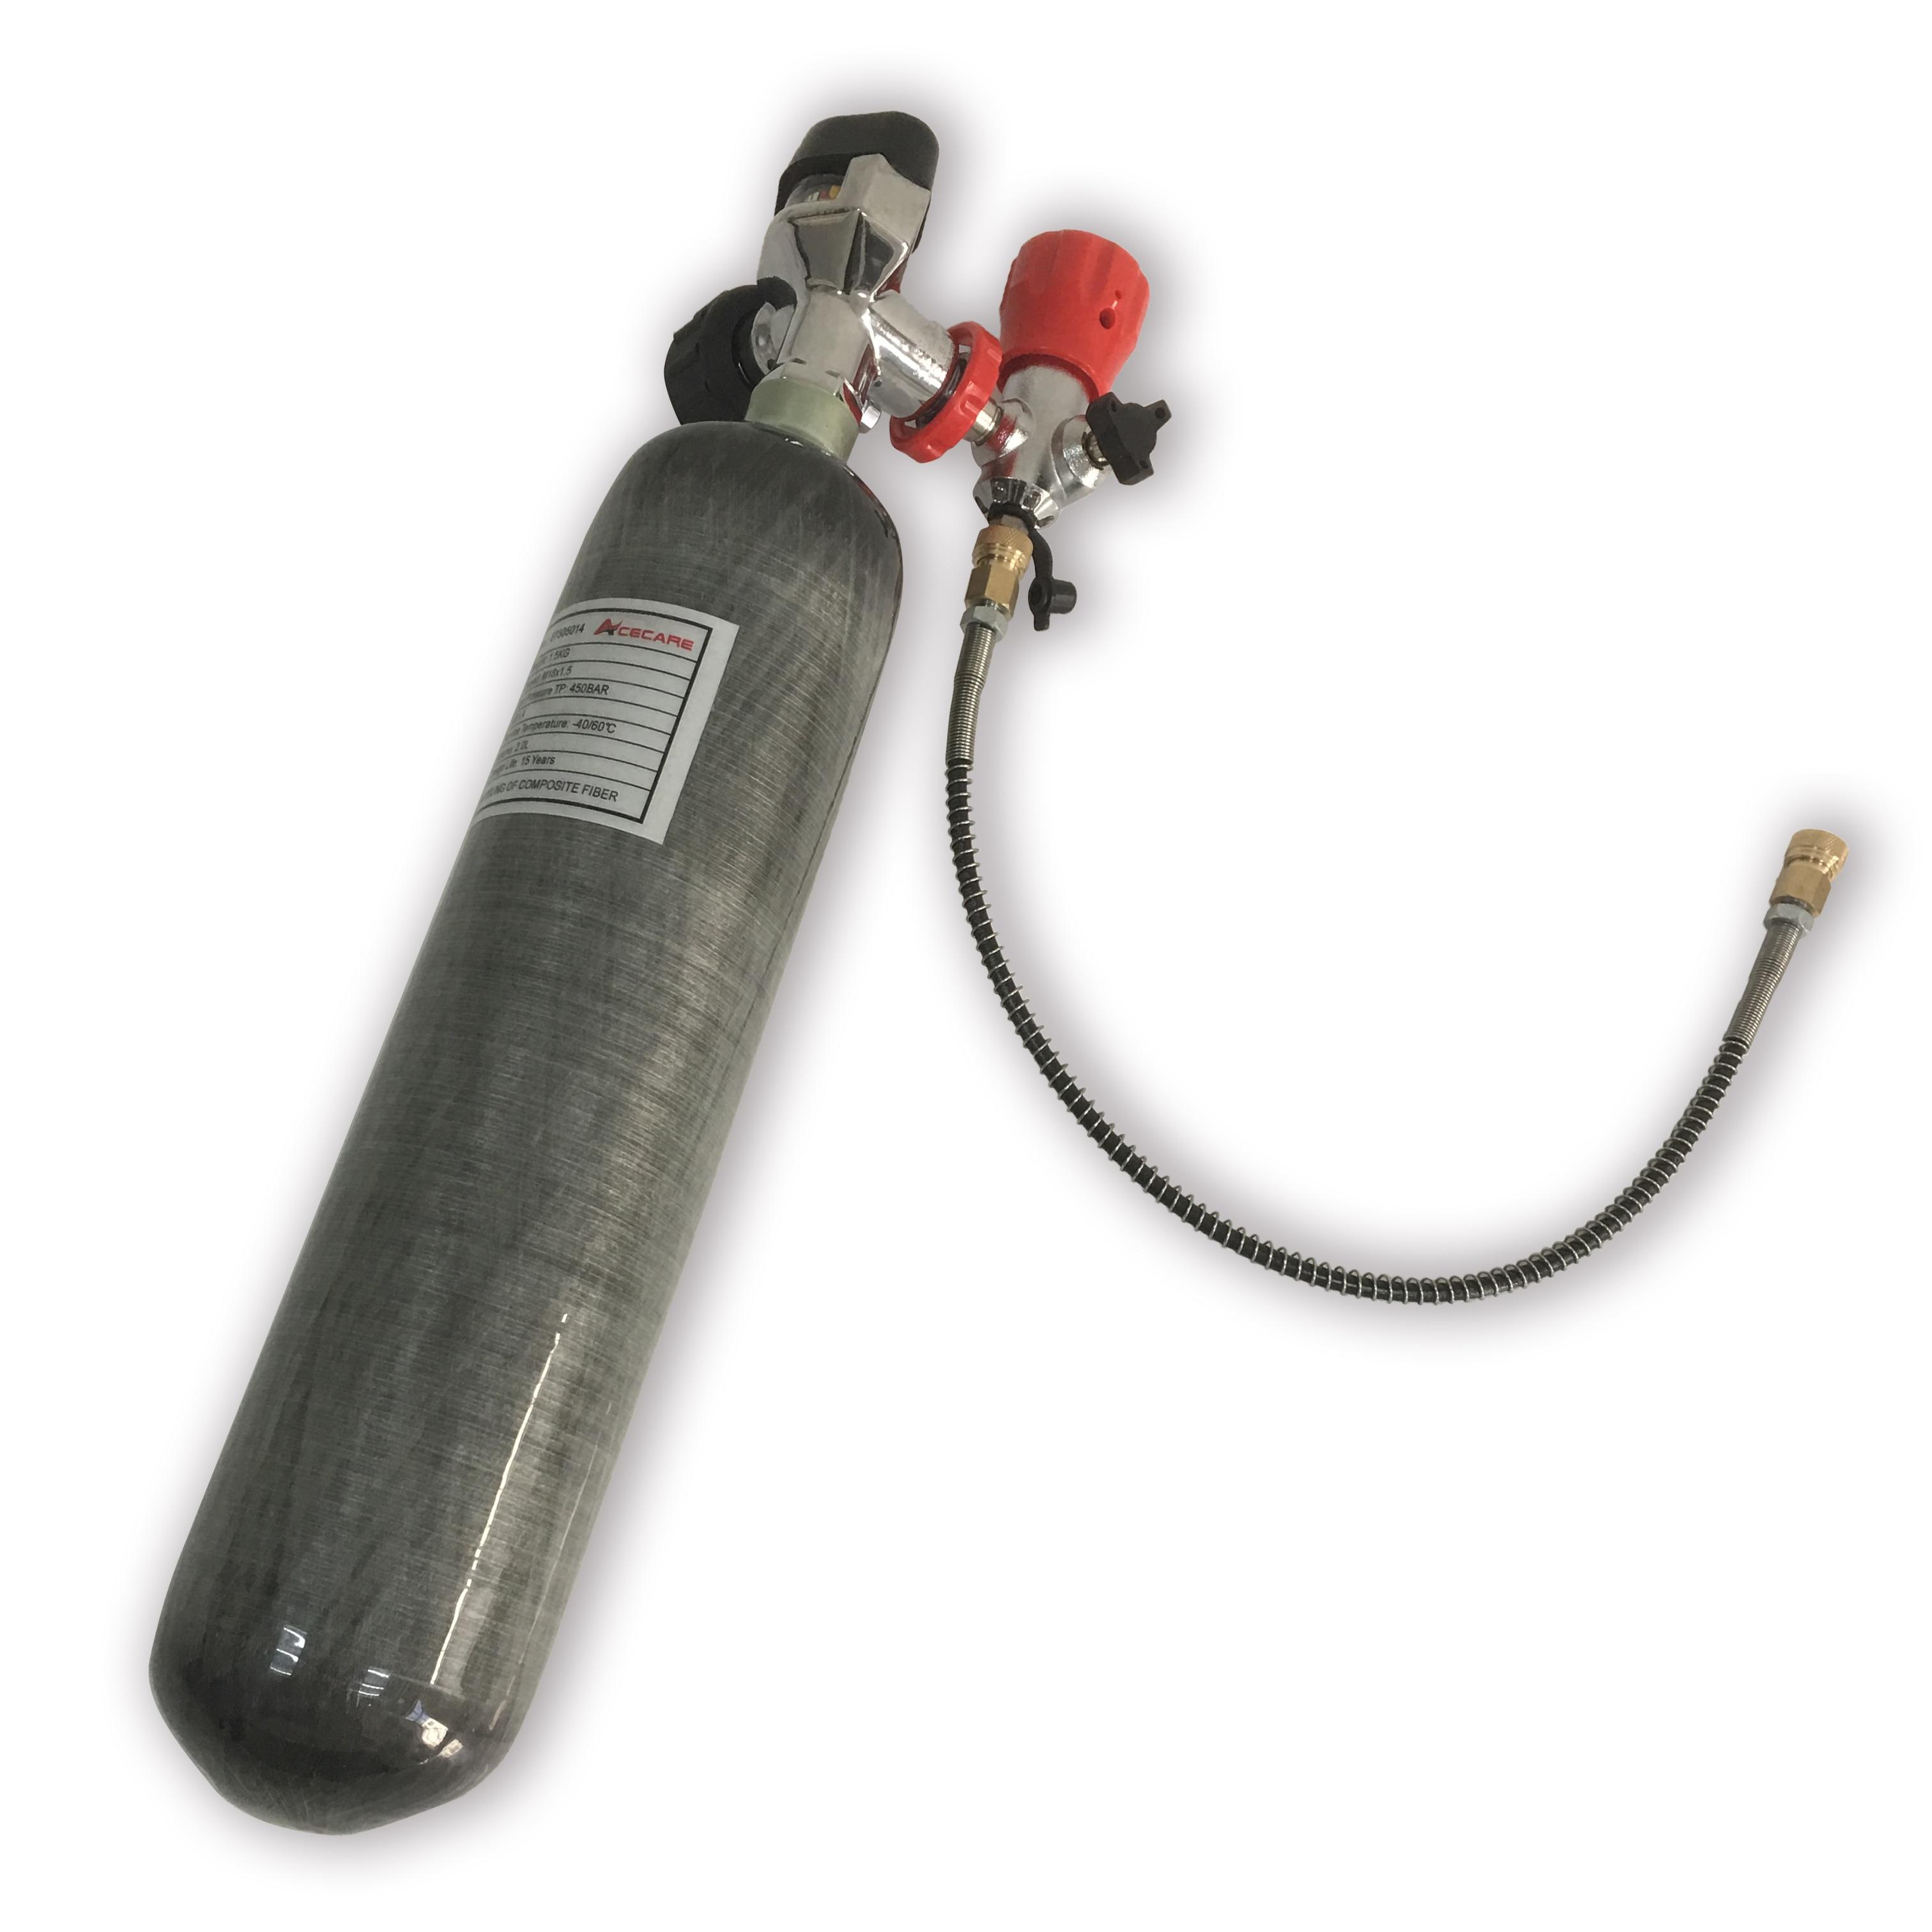 AC102201 Mini 2L 4500PSI 300Bar Carbon Fiber Cylinders PCP Gun Hunting Airsoft Gun Aur Rifle PCP Valve&Filling Station Acecare